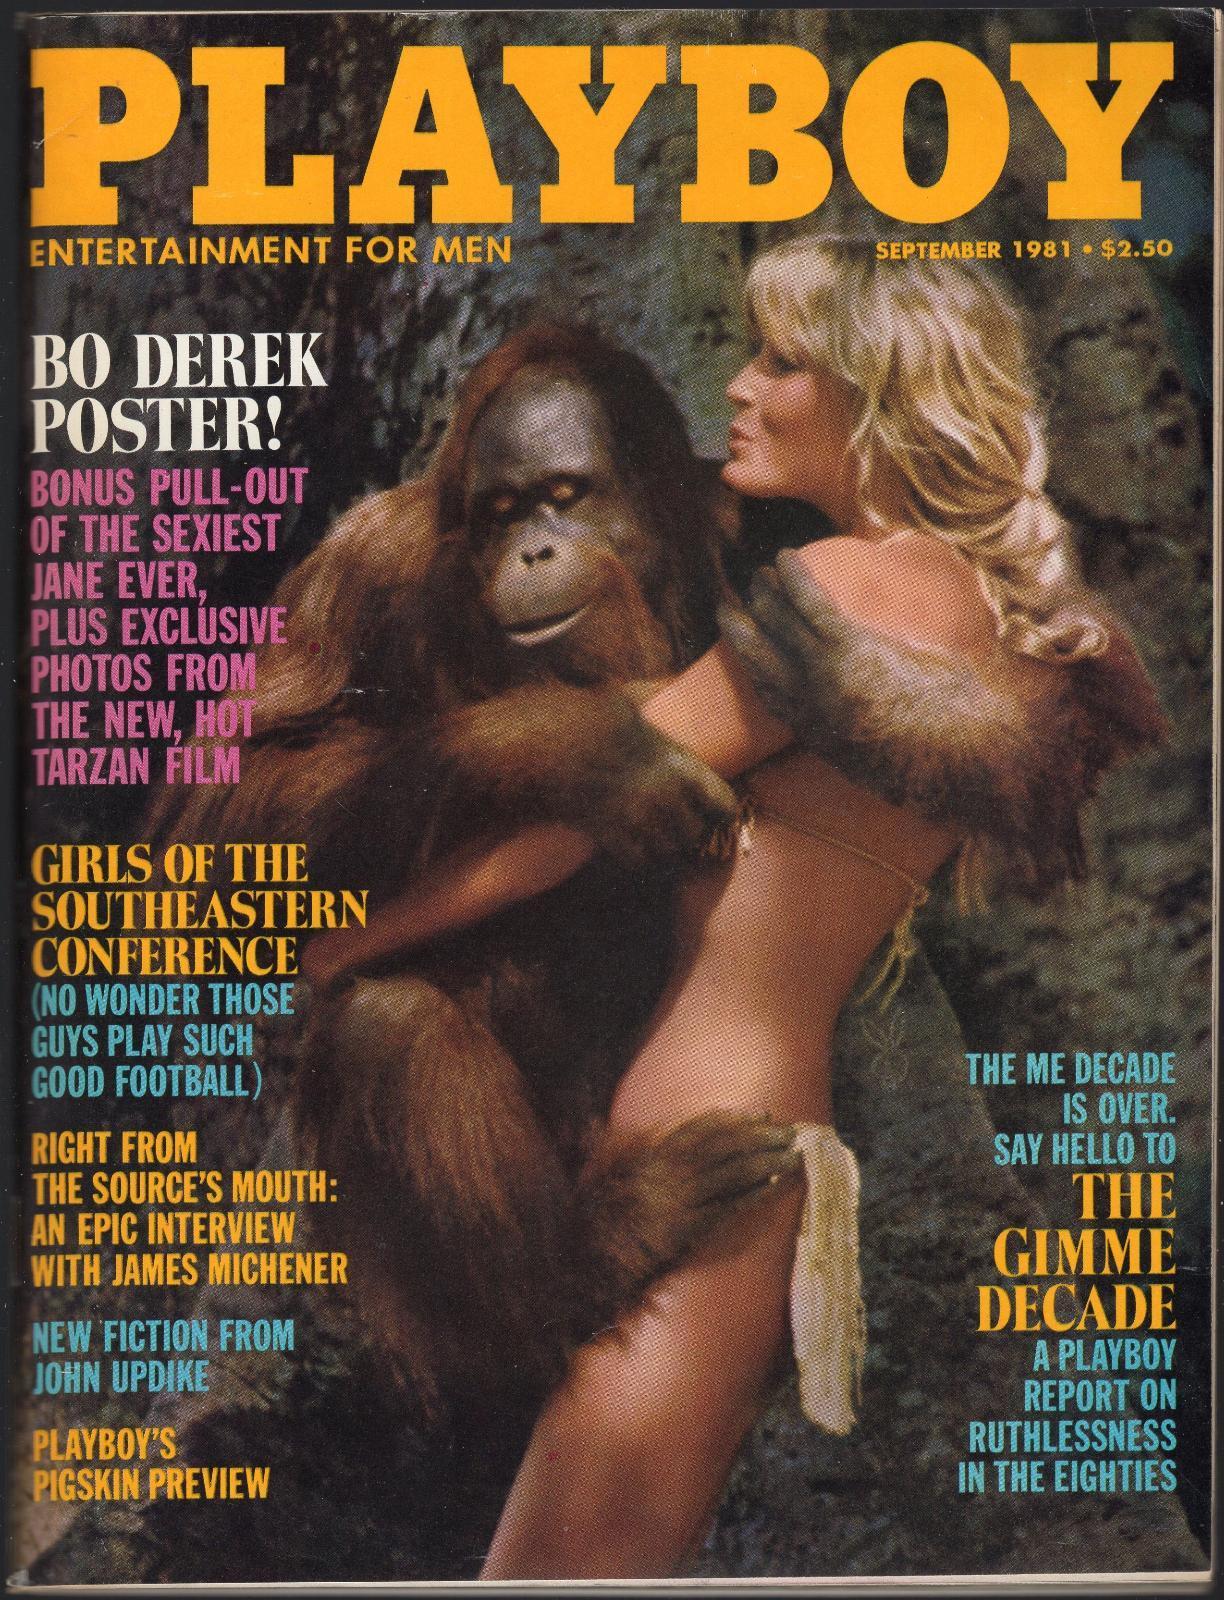 Jennifer aniston real nude